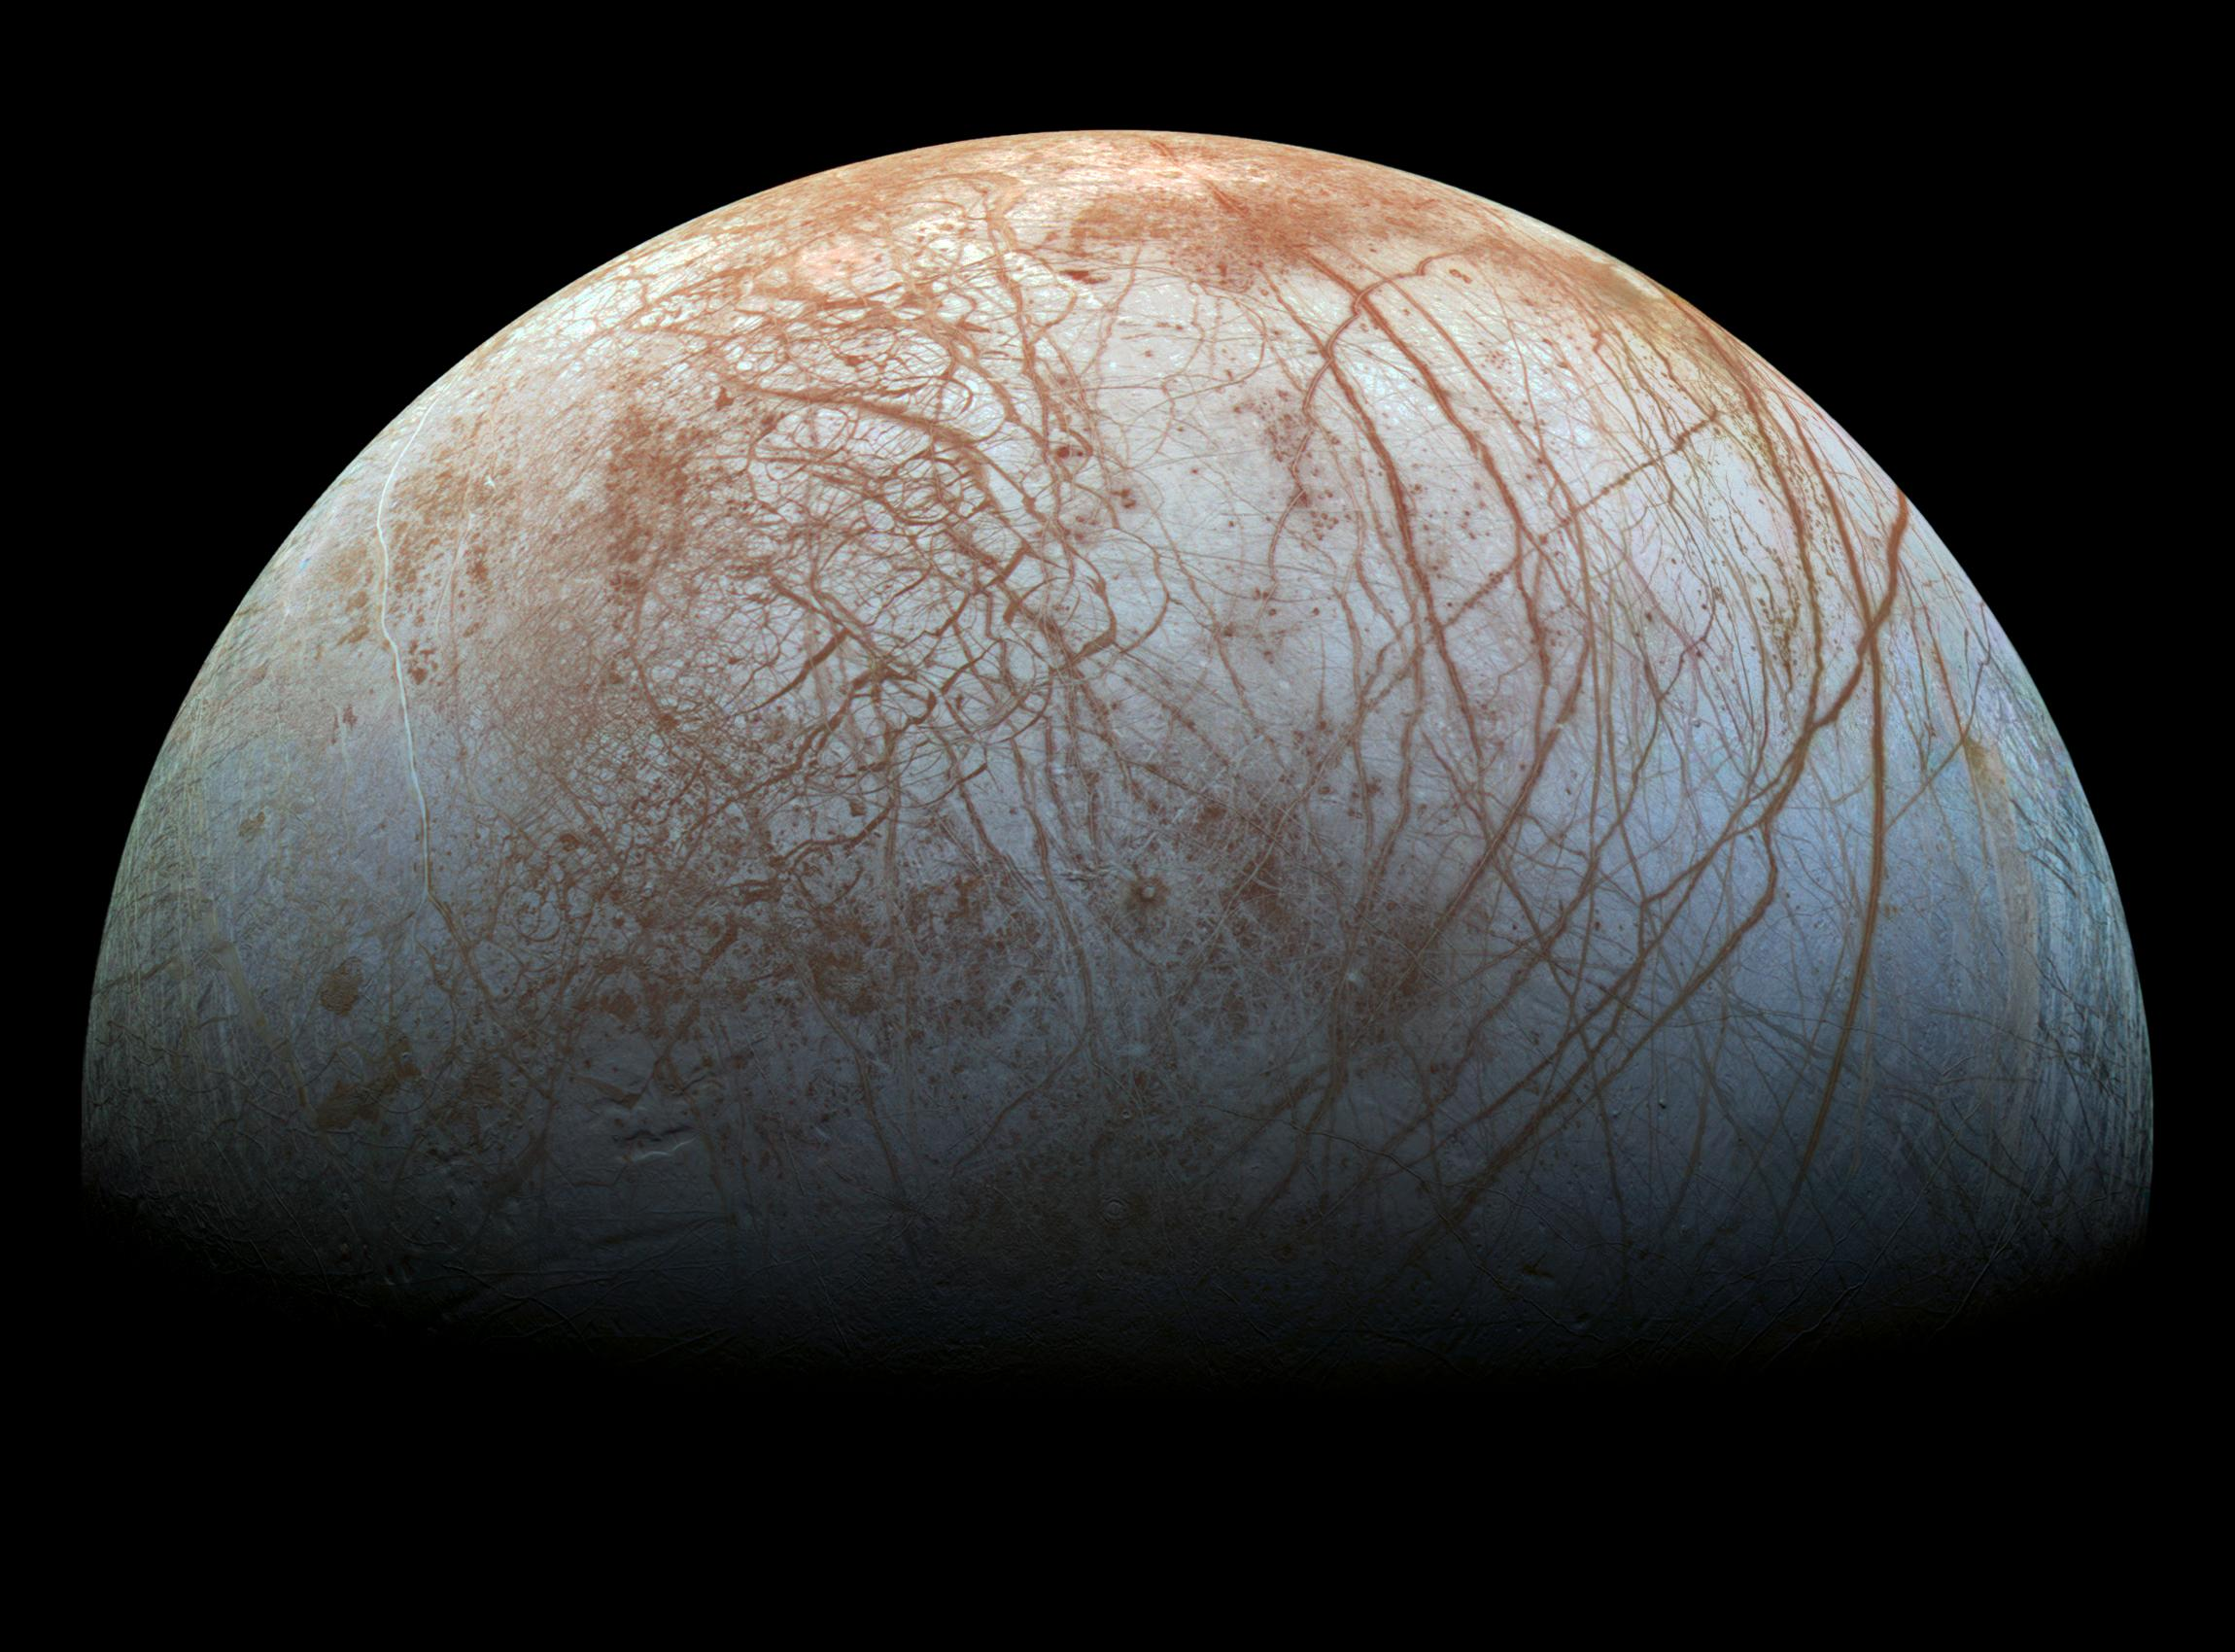 Europa vita oceano sotterraneo pianeta e satellite